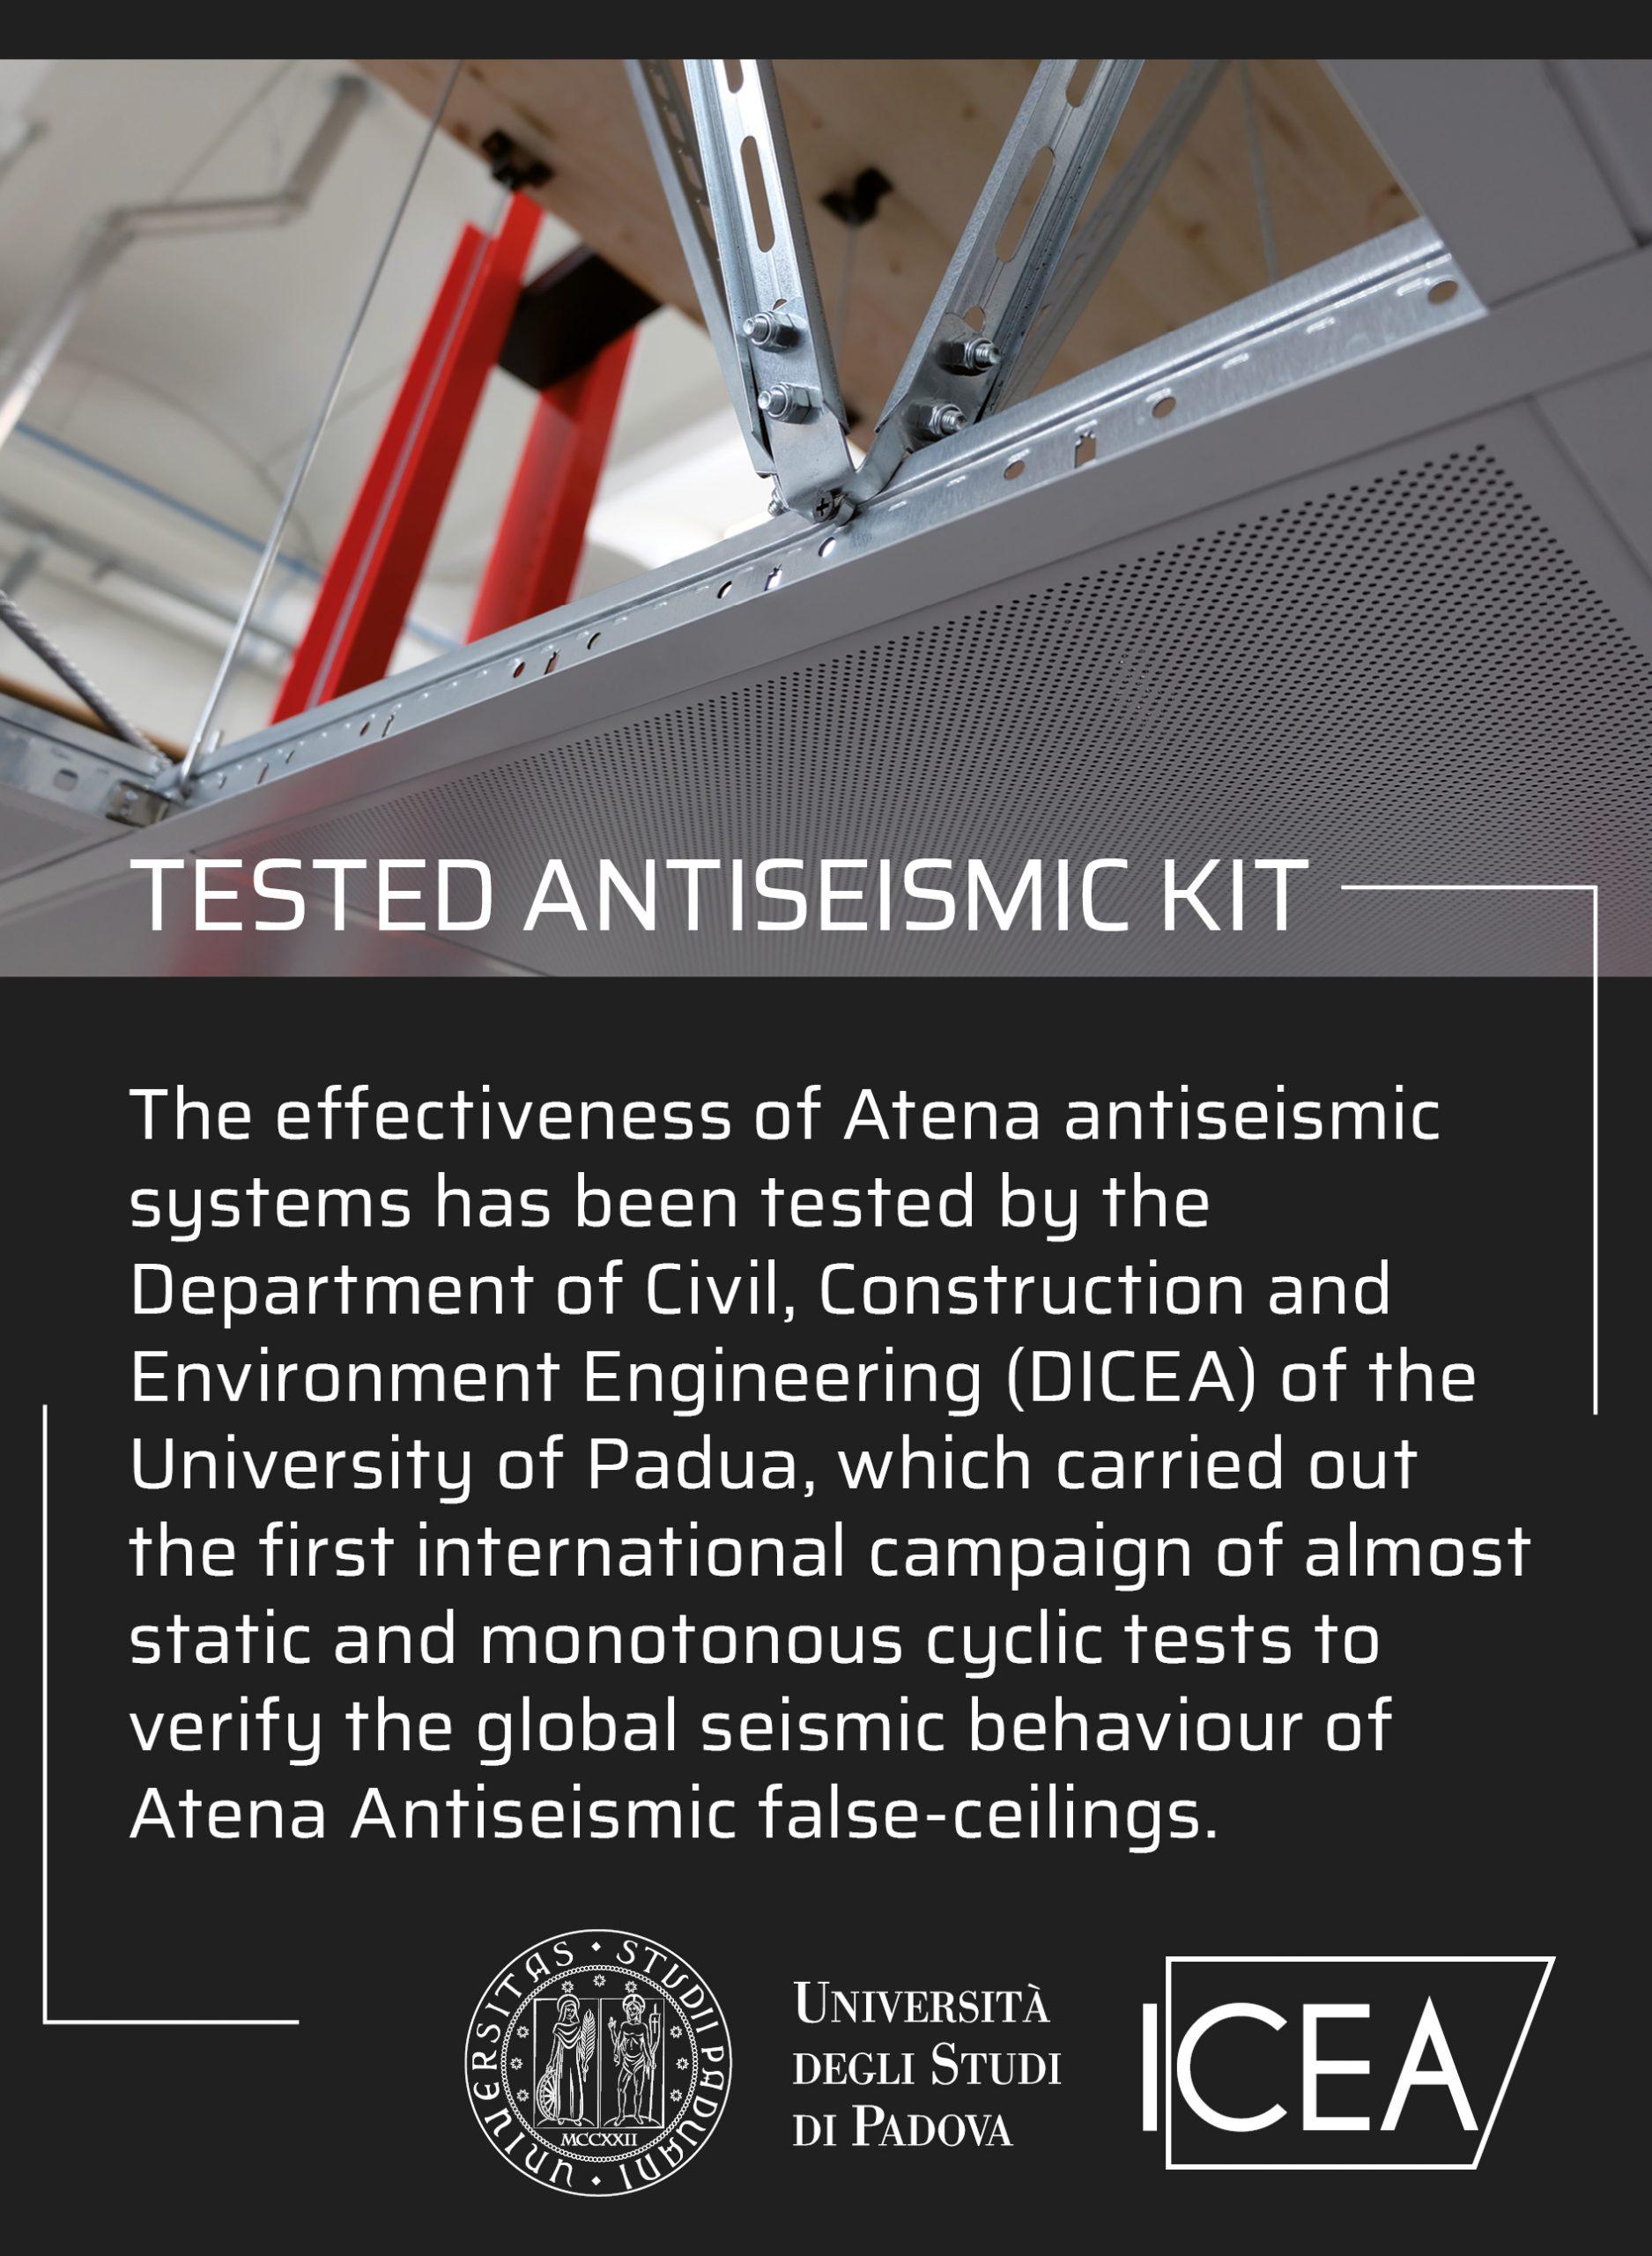 Controsoffitti antisismici | Antiseismic ceilings